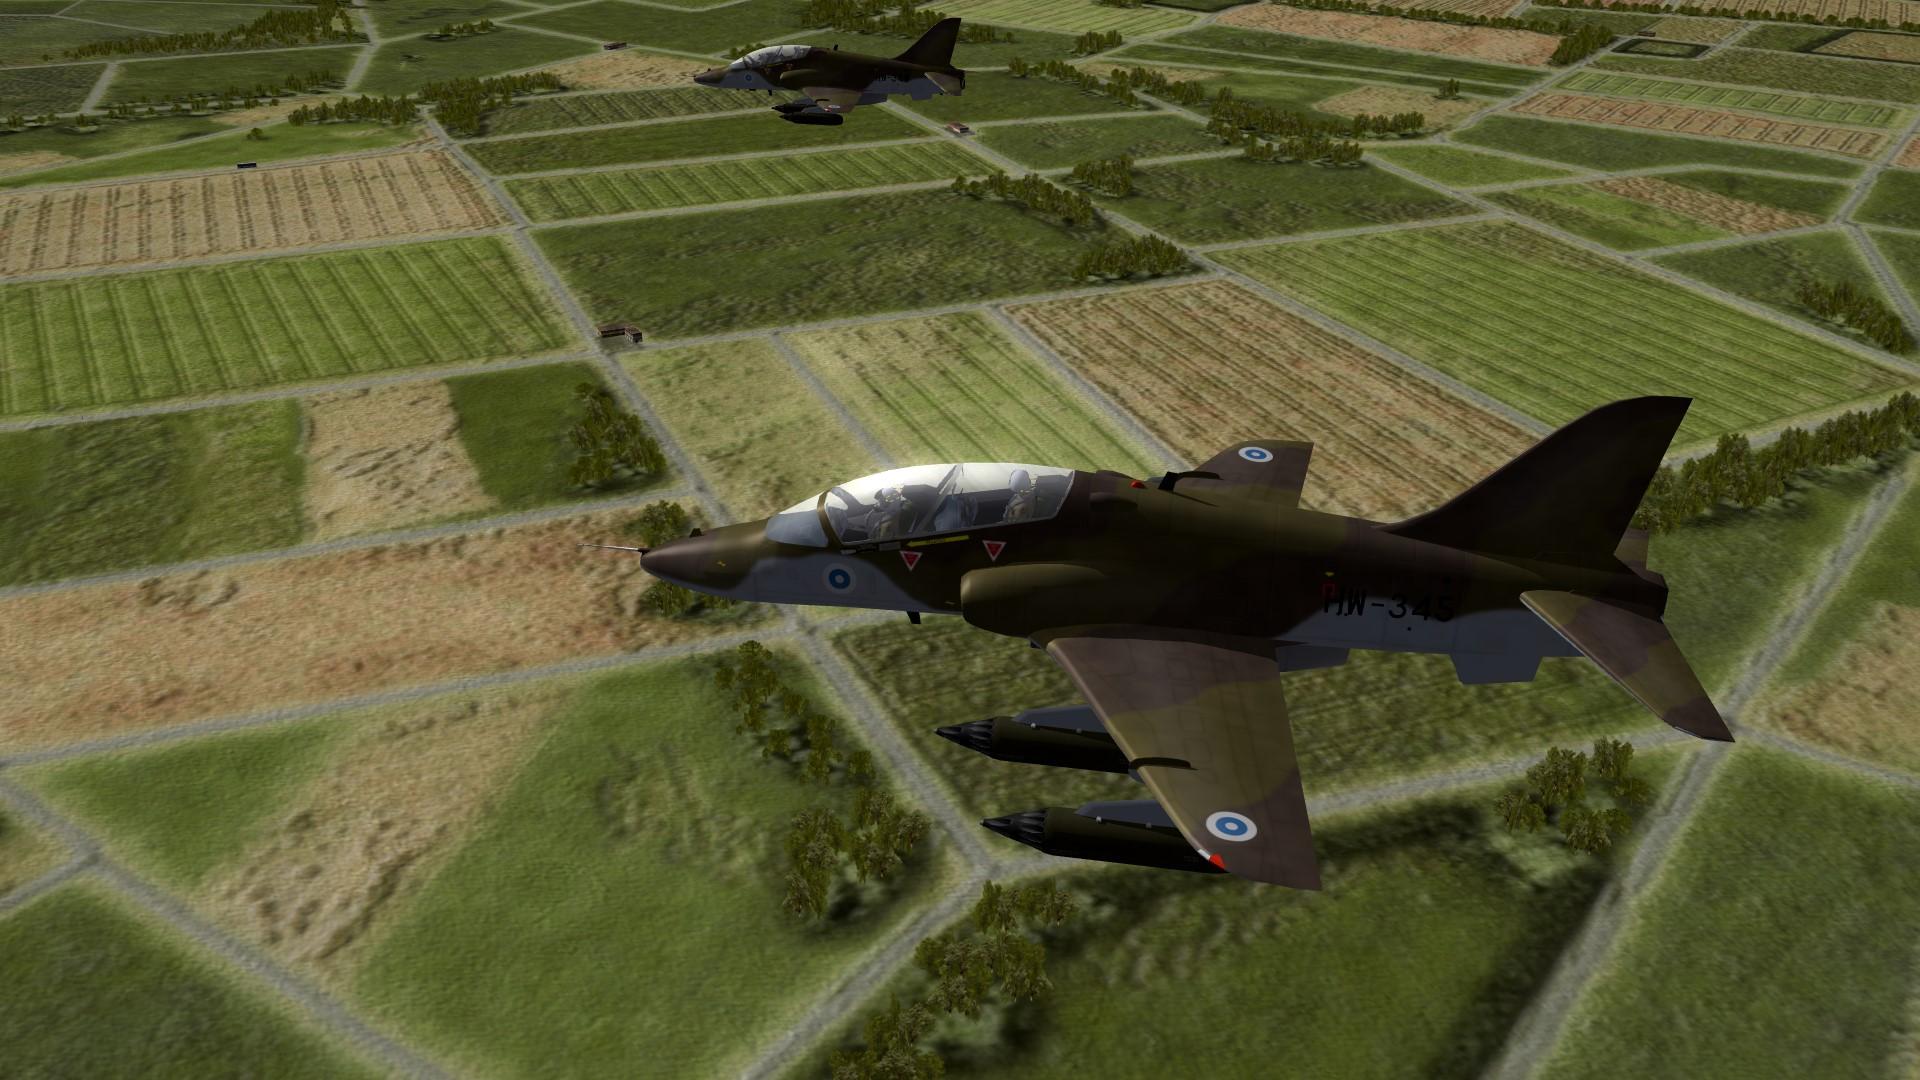 BAe Hawk Mk. 51